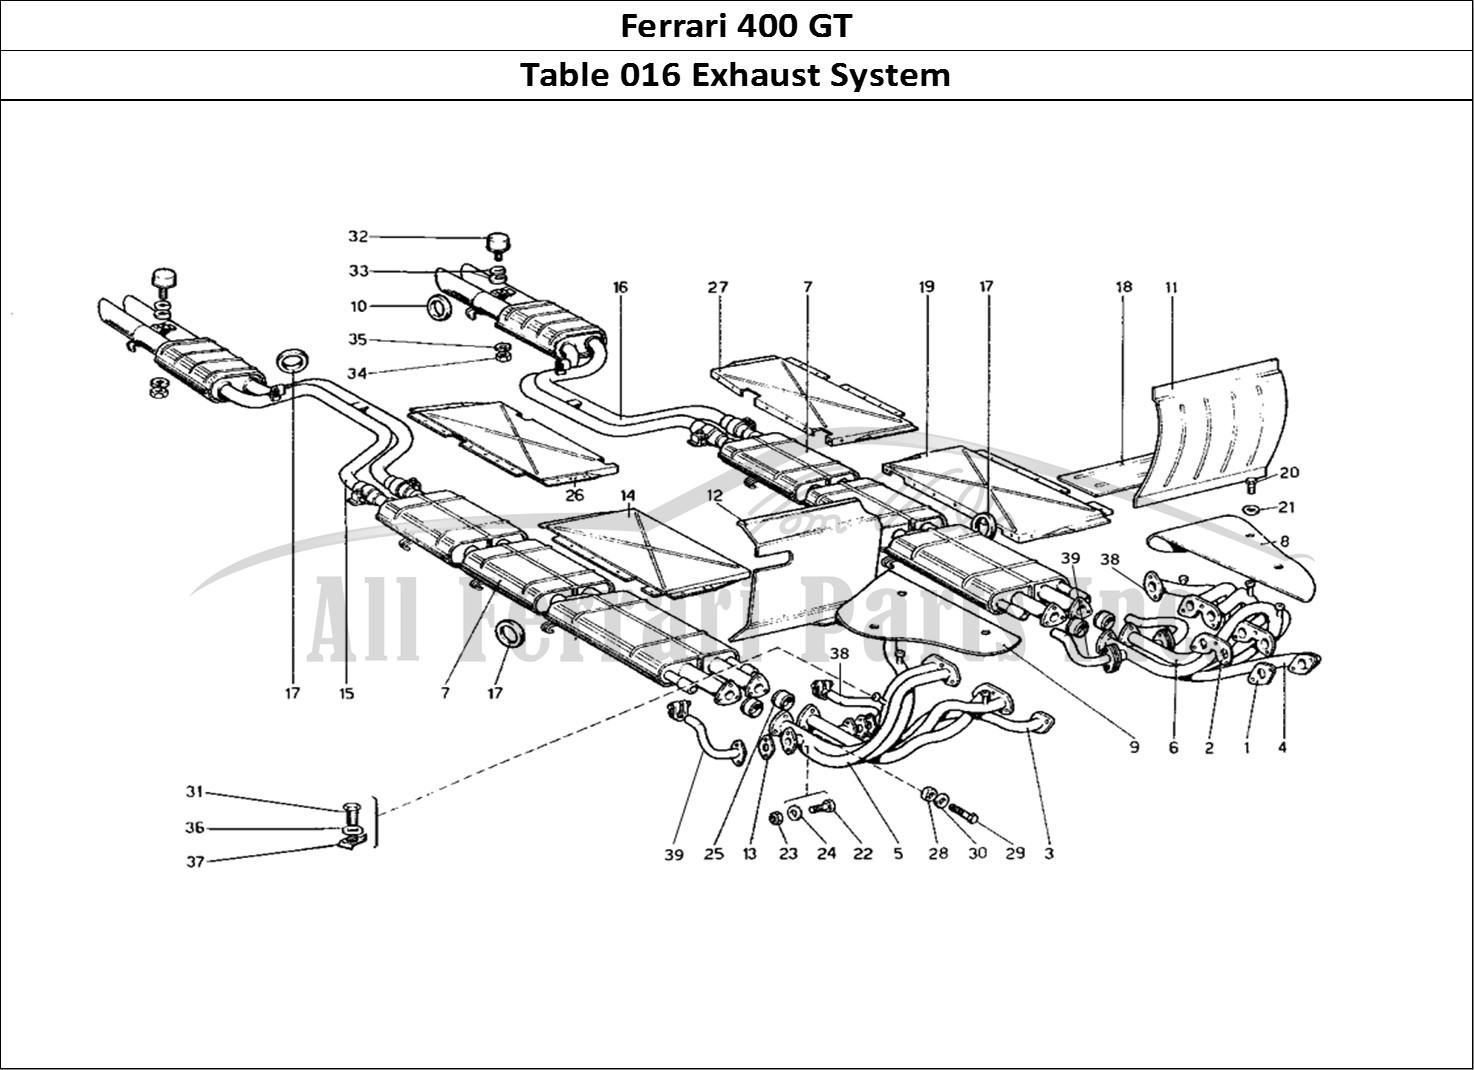 ferrari 400 gt mechanical table 016 exhaust system